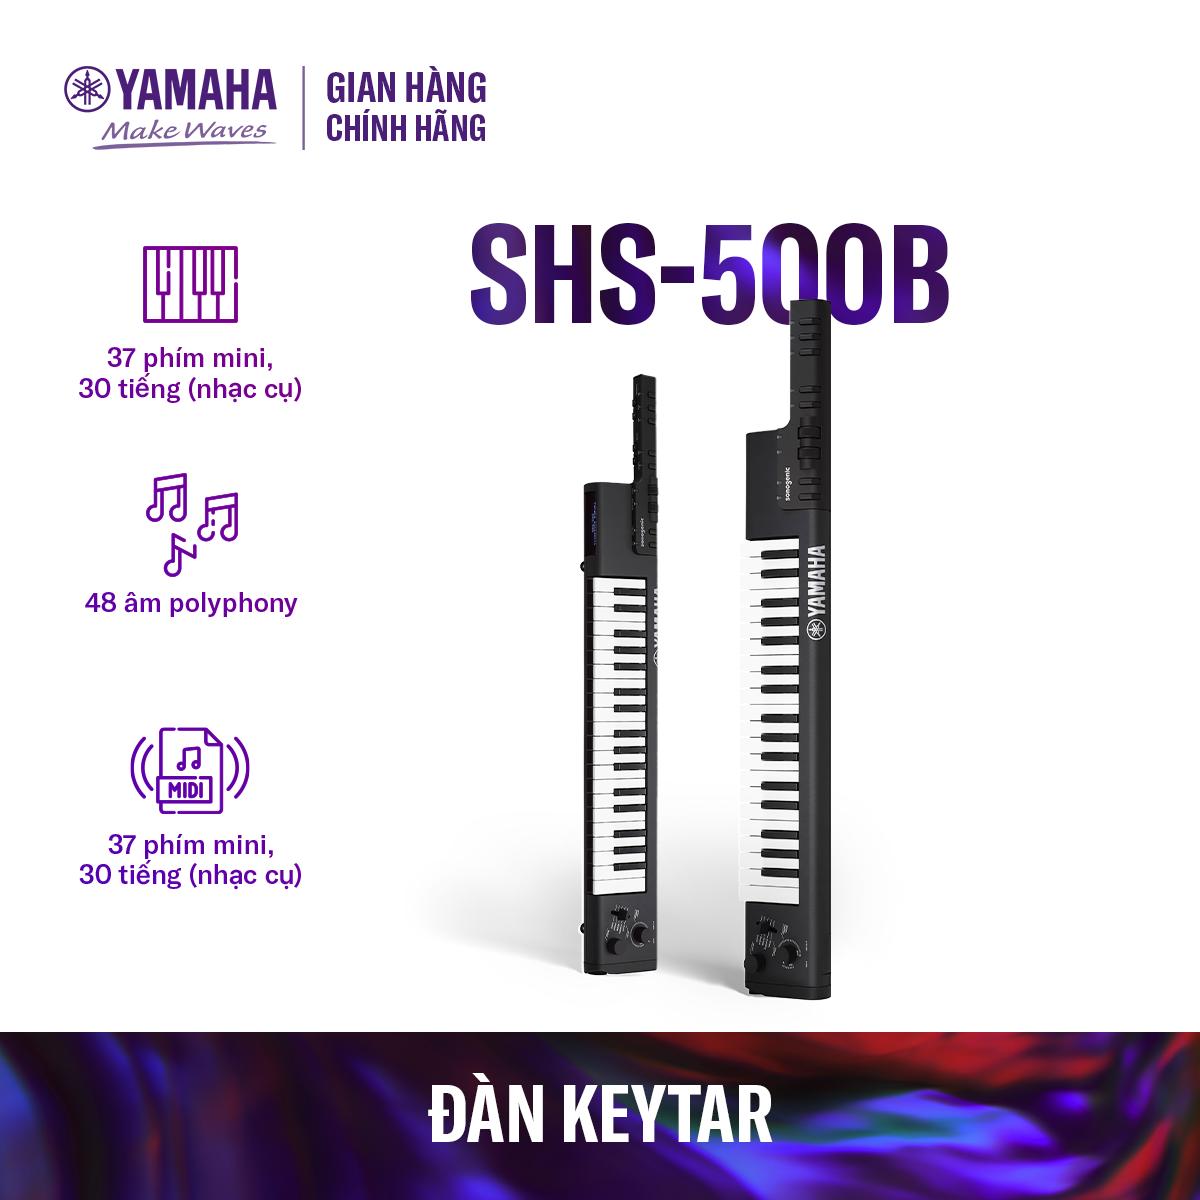 Đàn Keytar điện tử Yamaha SHS-500